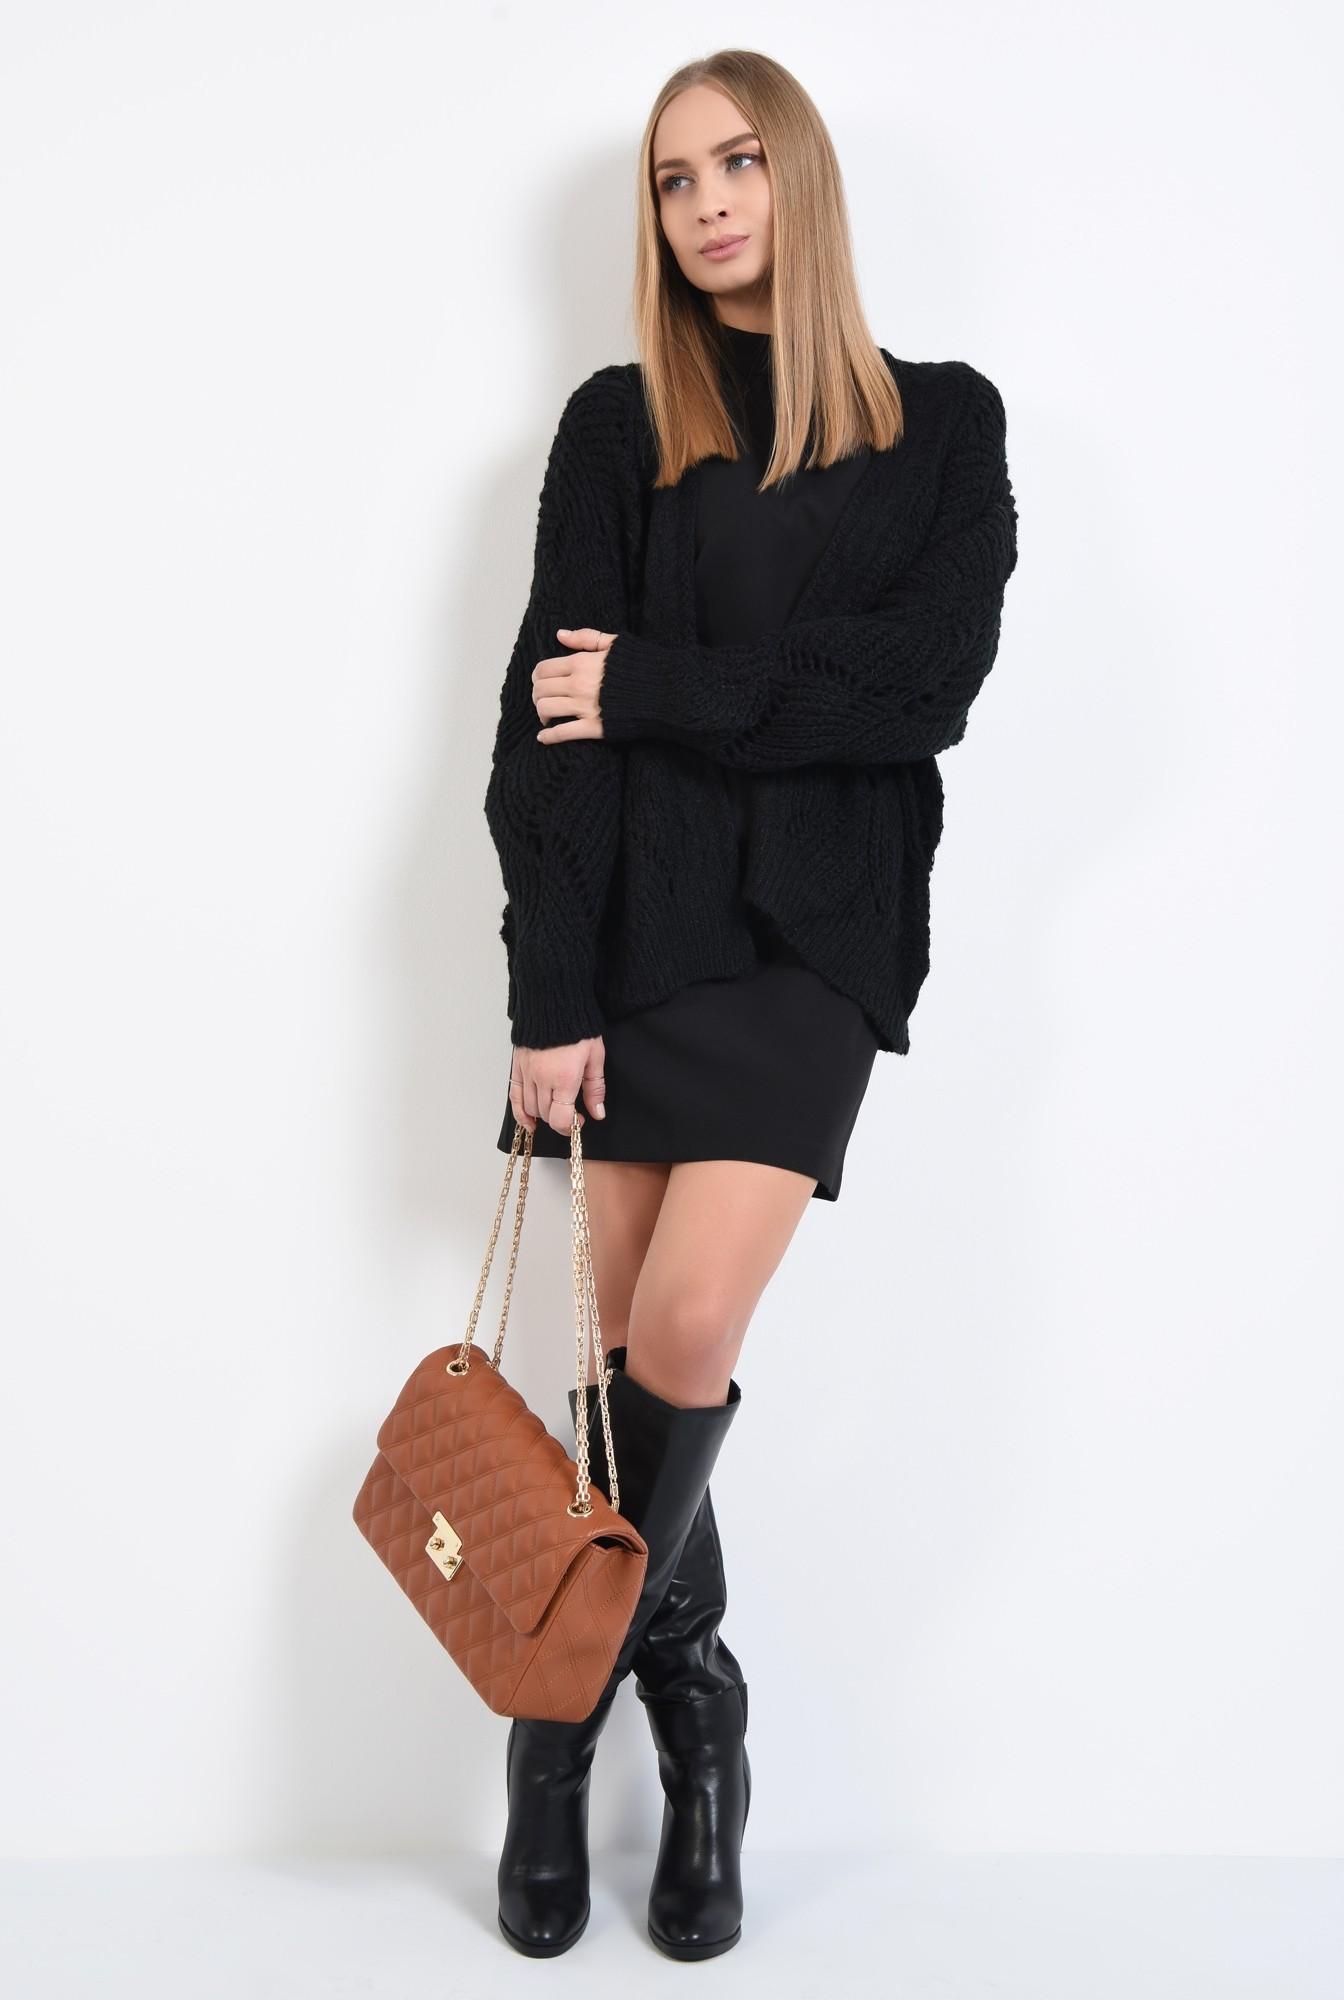 3 - pulover cu gaurele, motive ajurate, maneci bufante, negru